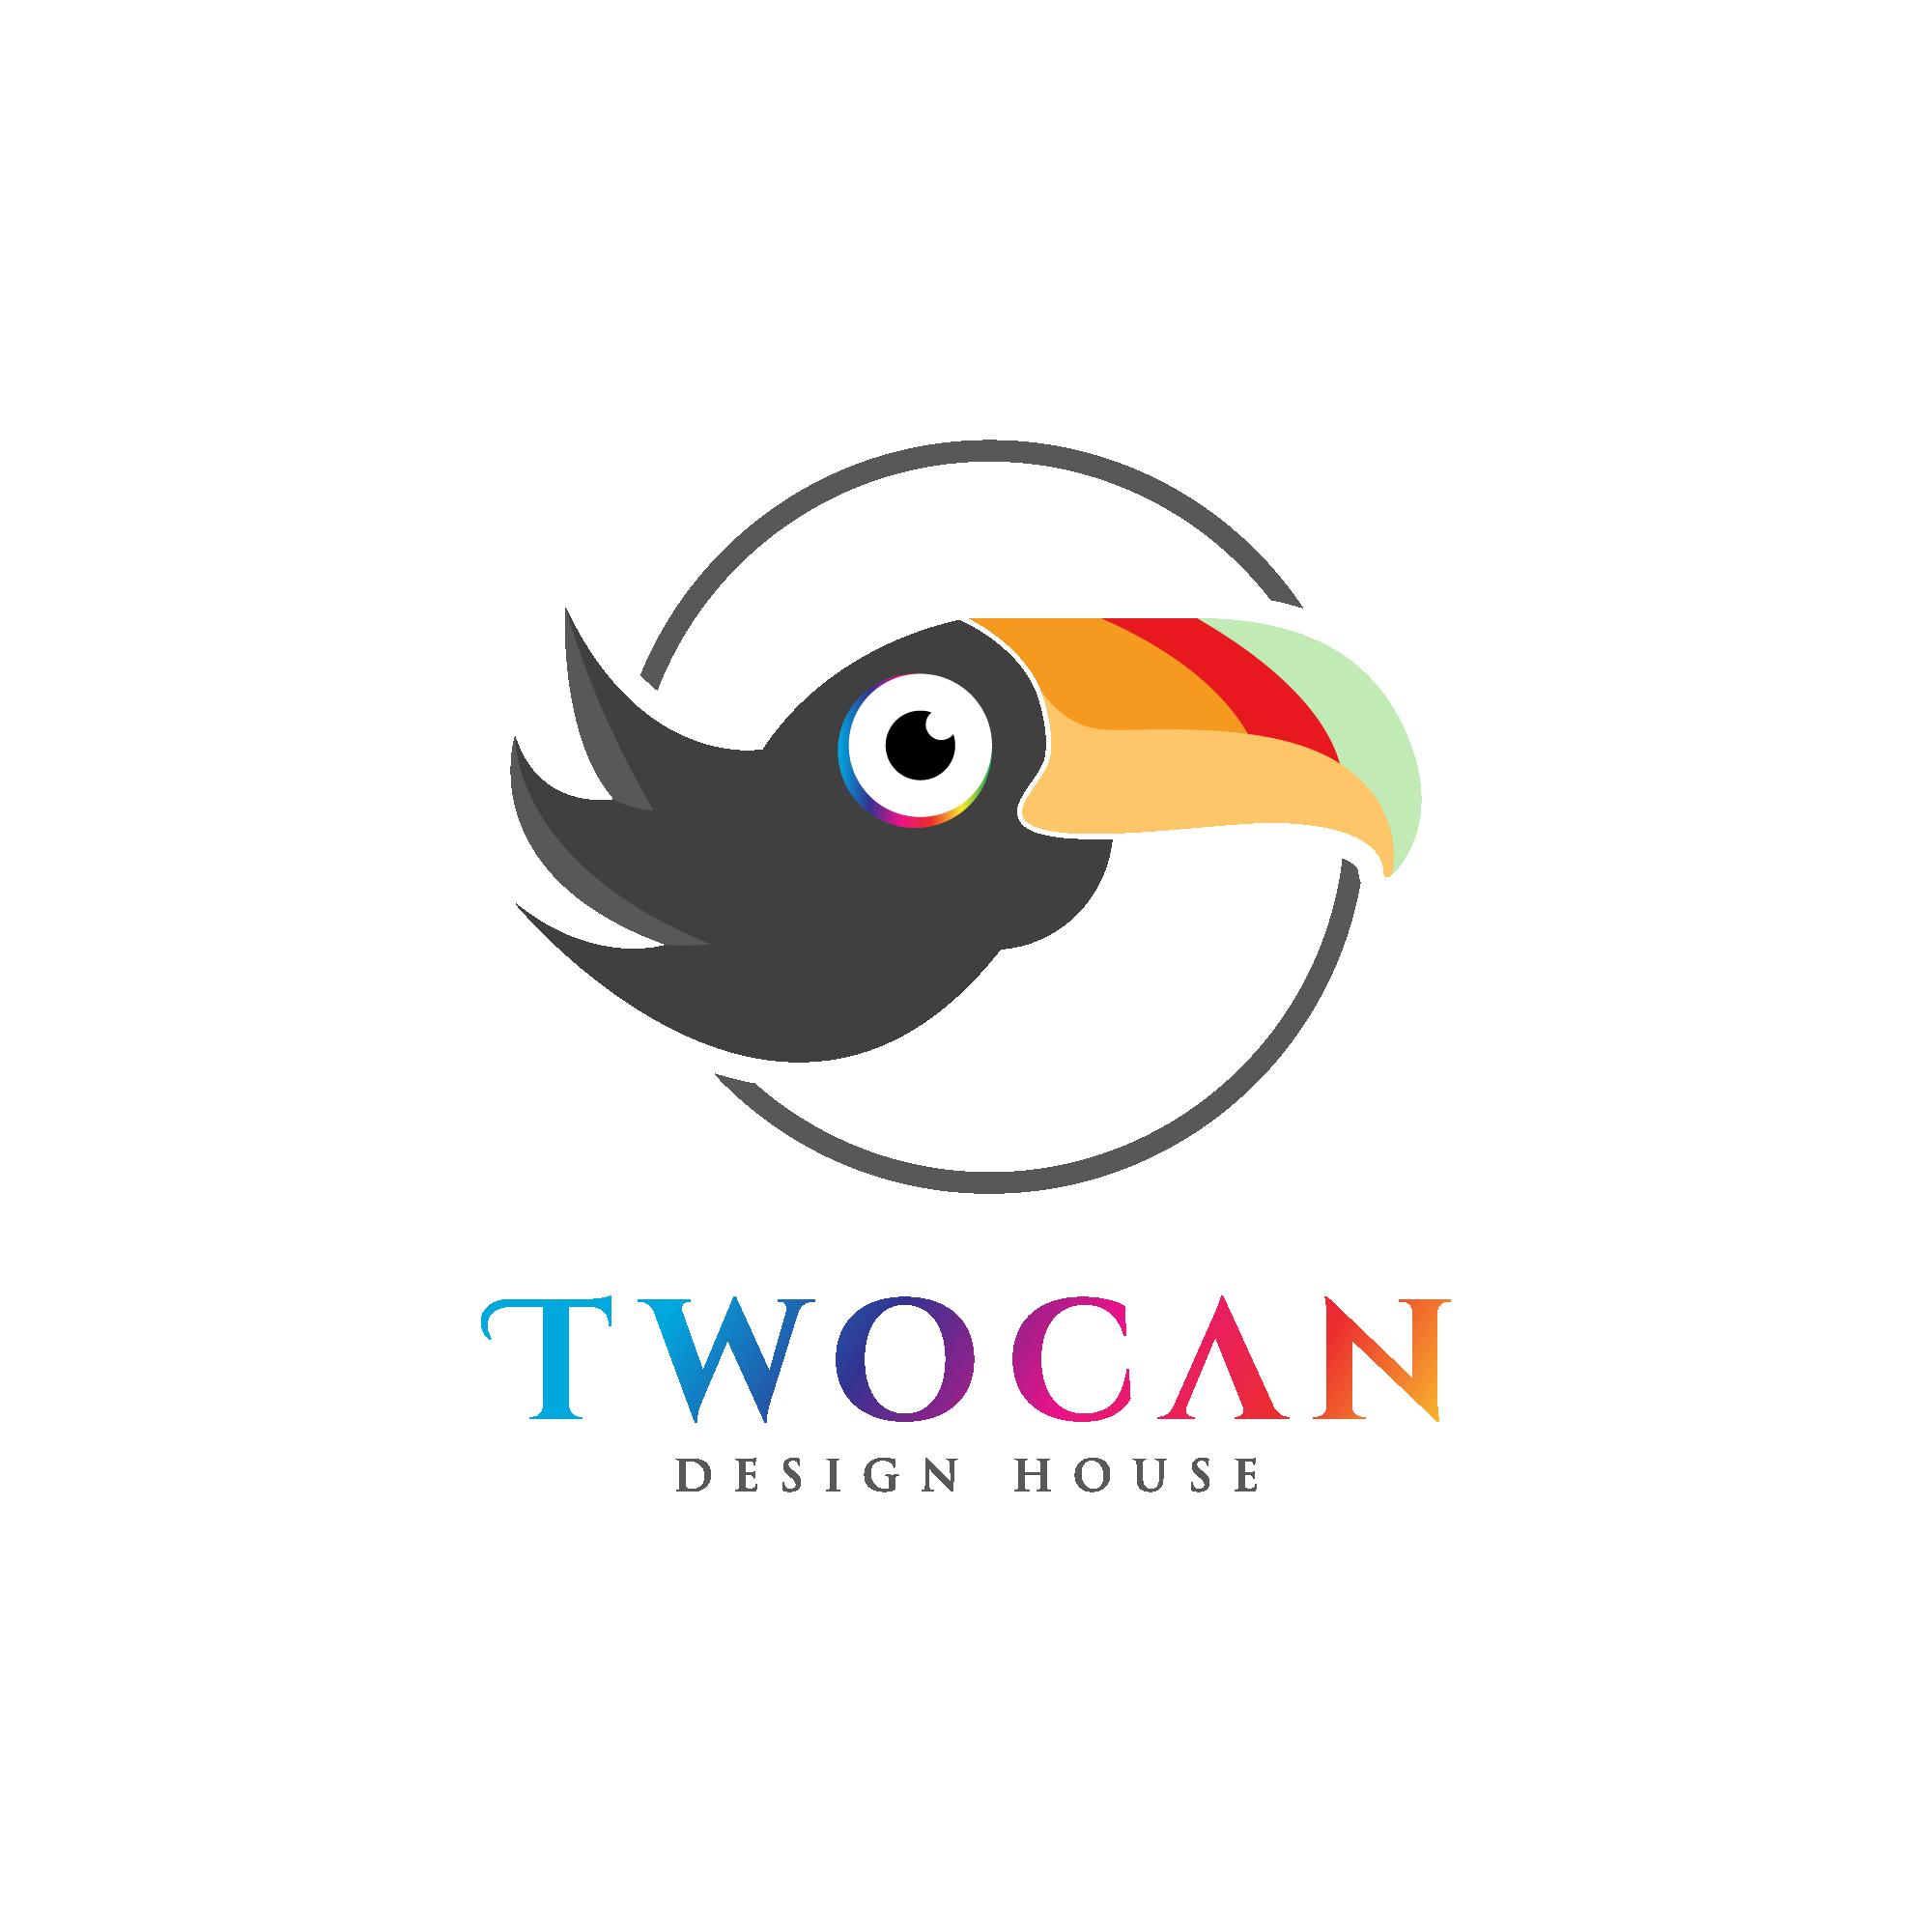 TwoCan Design House